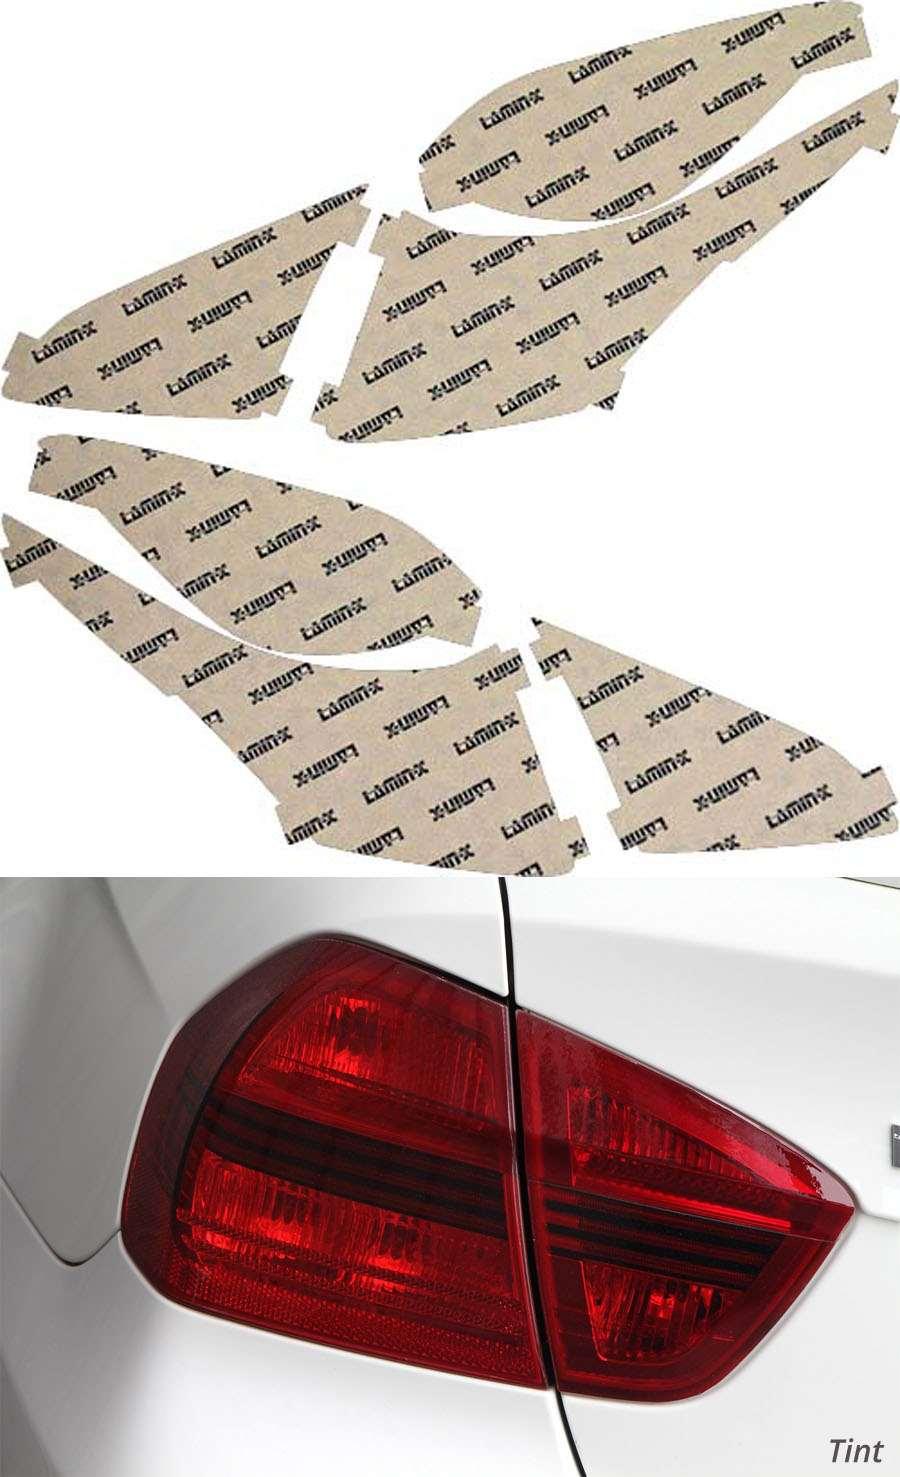 Nissan Murano 08-14 Tint Tail Light Covers Lamin-X N226T